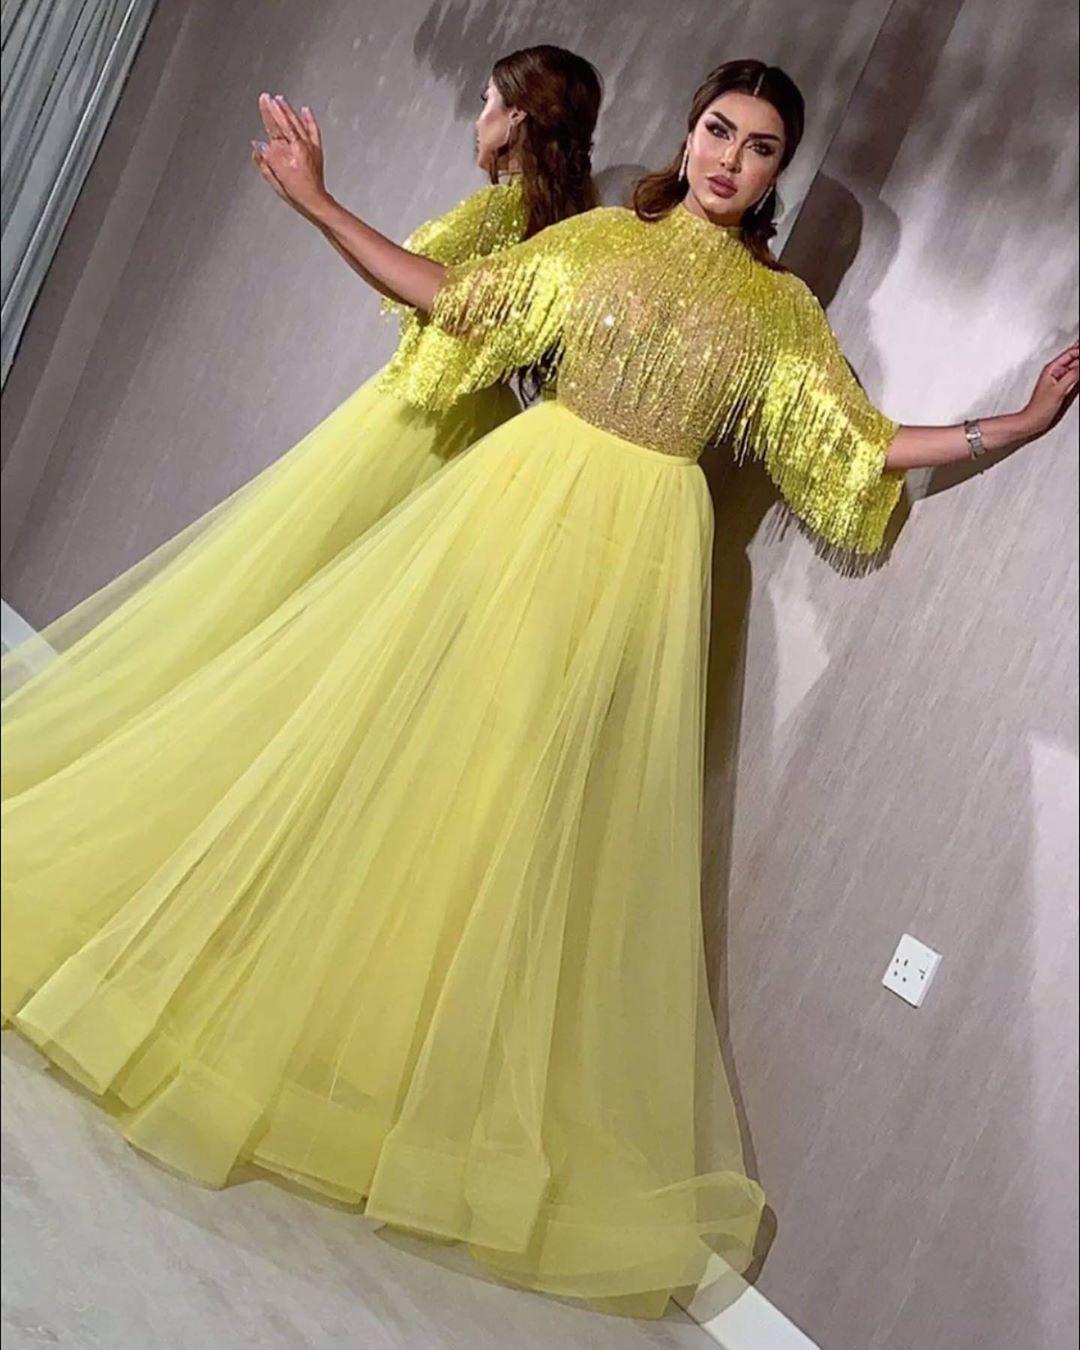 Gorgeous Yellow Dubai Evening Dress Beading A Line Tulle Formal Plus Size Prom Dresses Long Party Gow In 2021 Evening Dress Beaded Long Party Gowns Dubai Fashion Women [ 1350 x 1080 Pixel ]